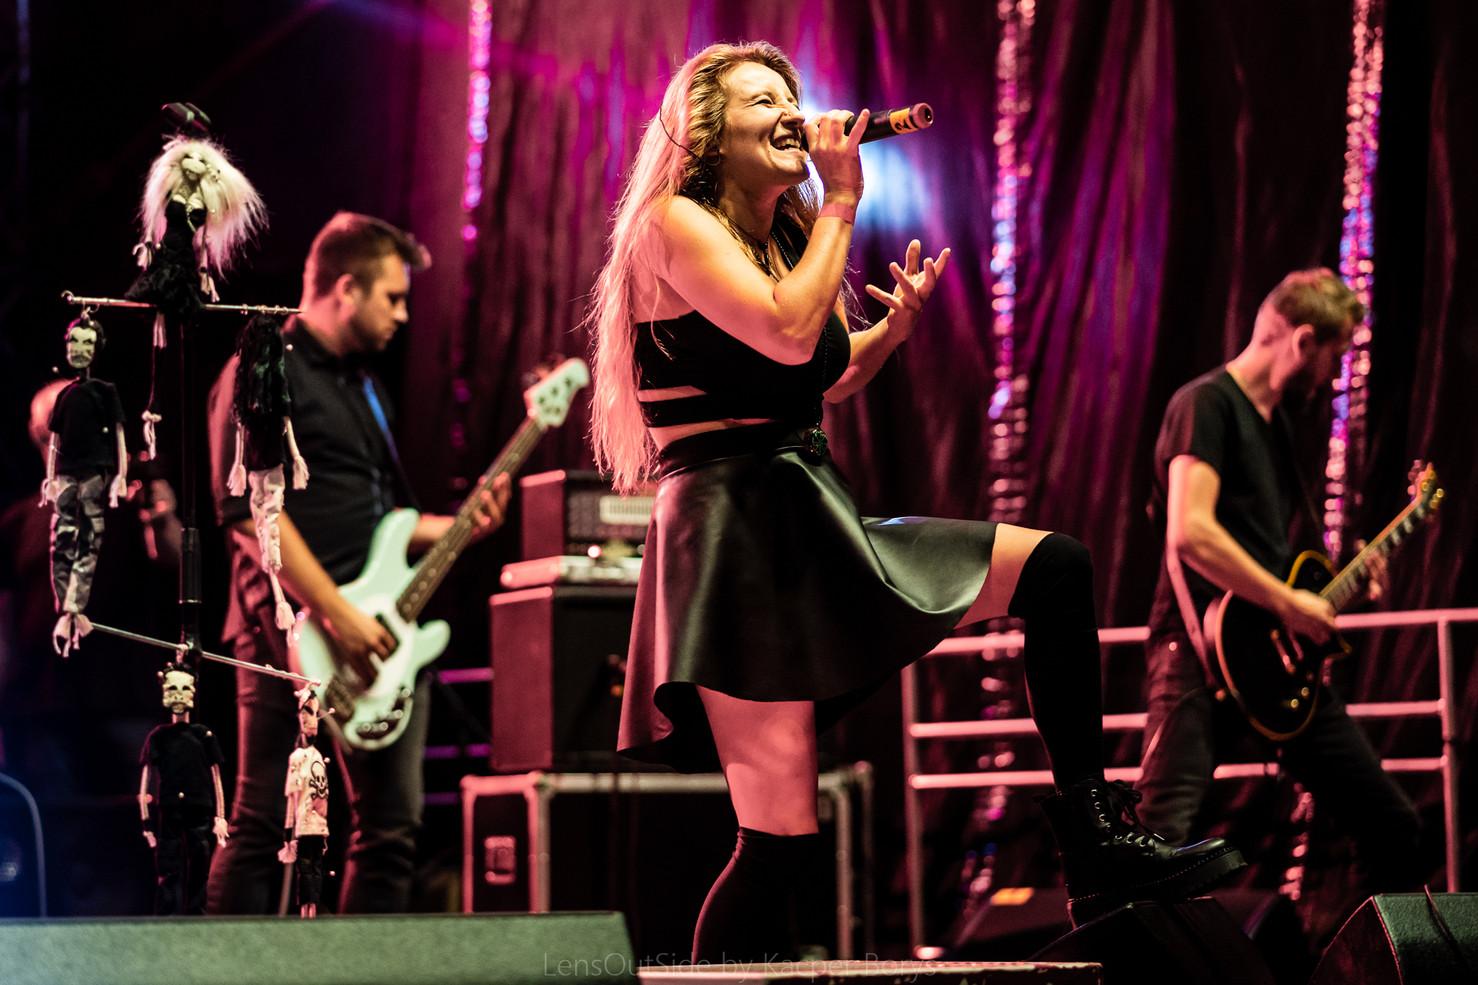 Krusher - Jasło - KrushFest (07.09.2019)